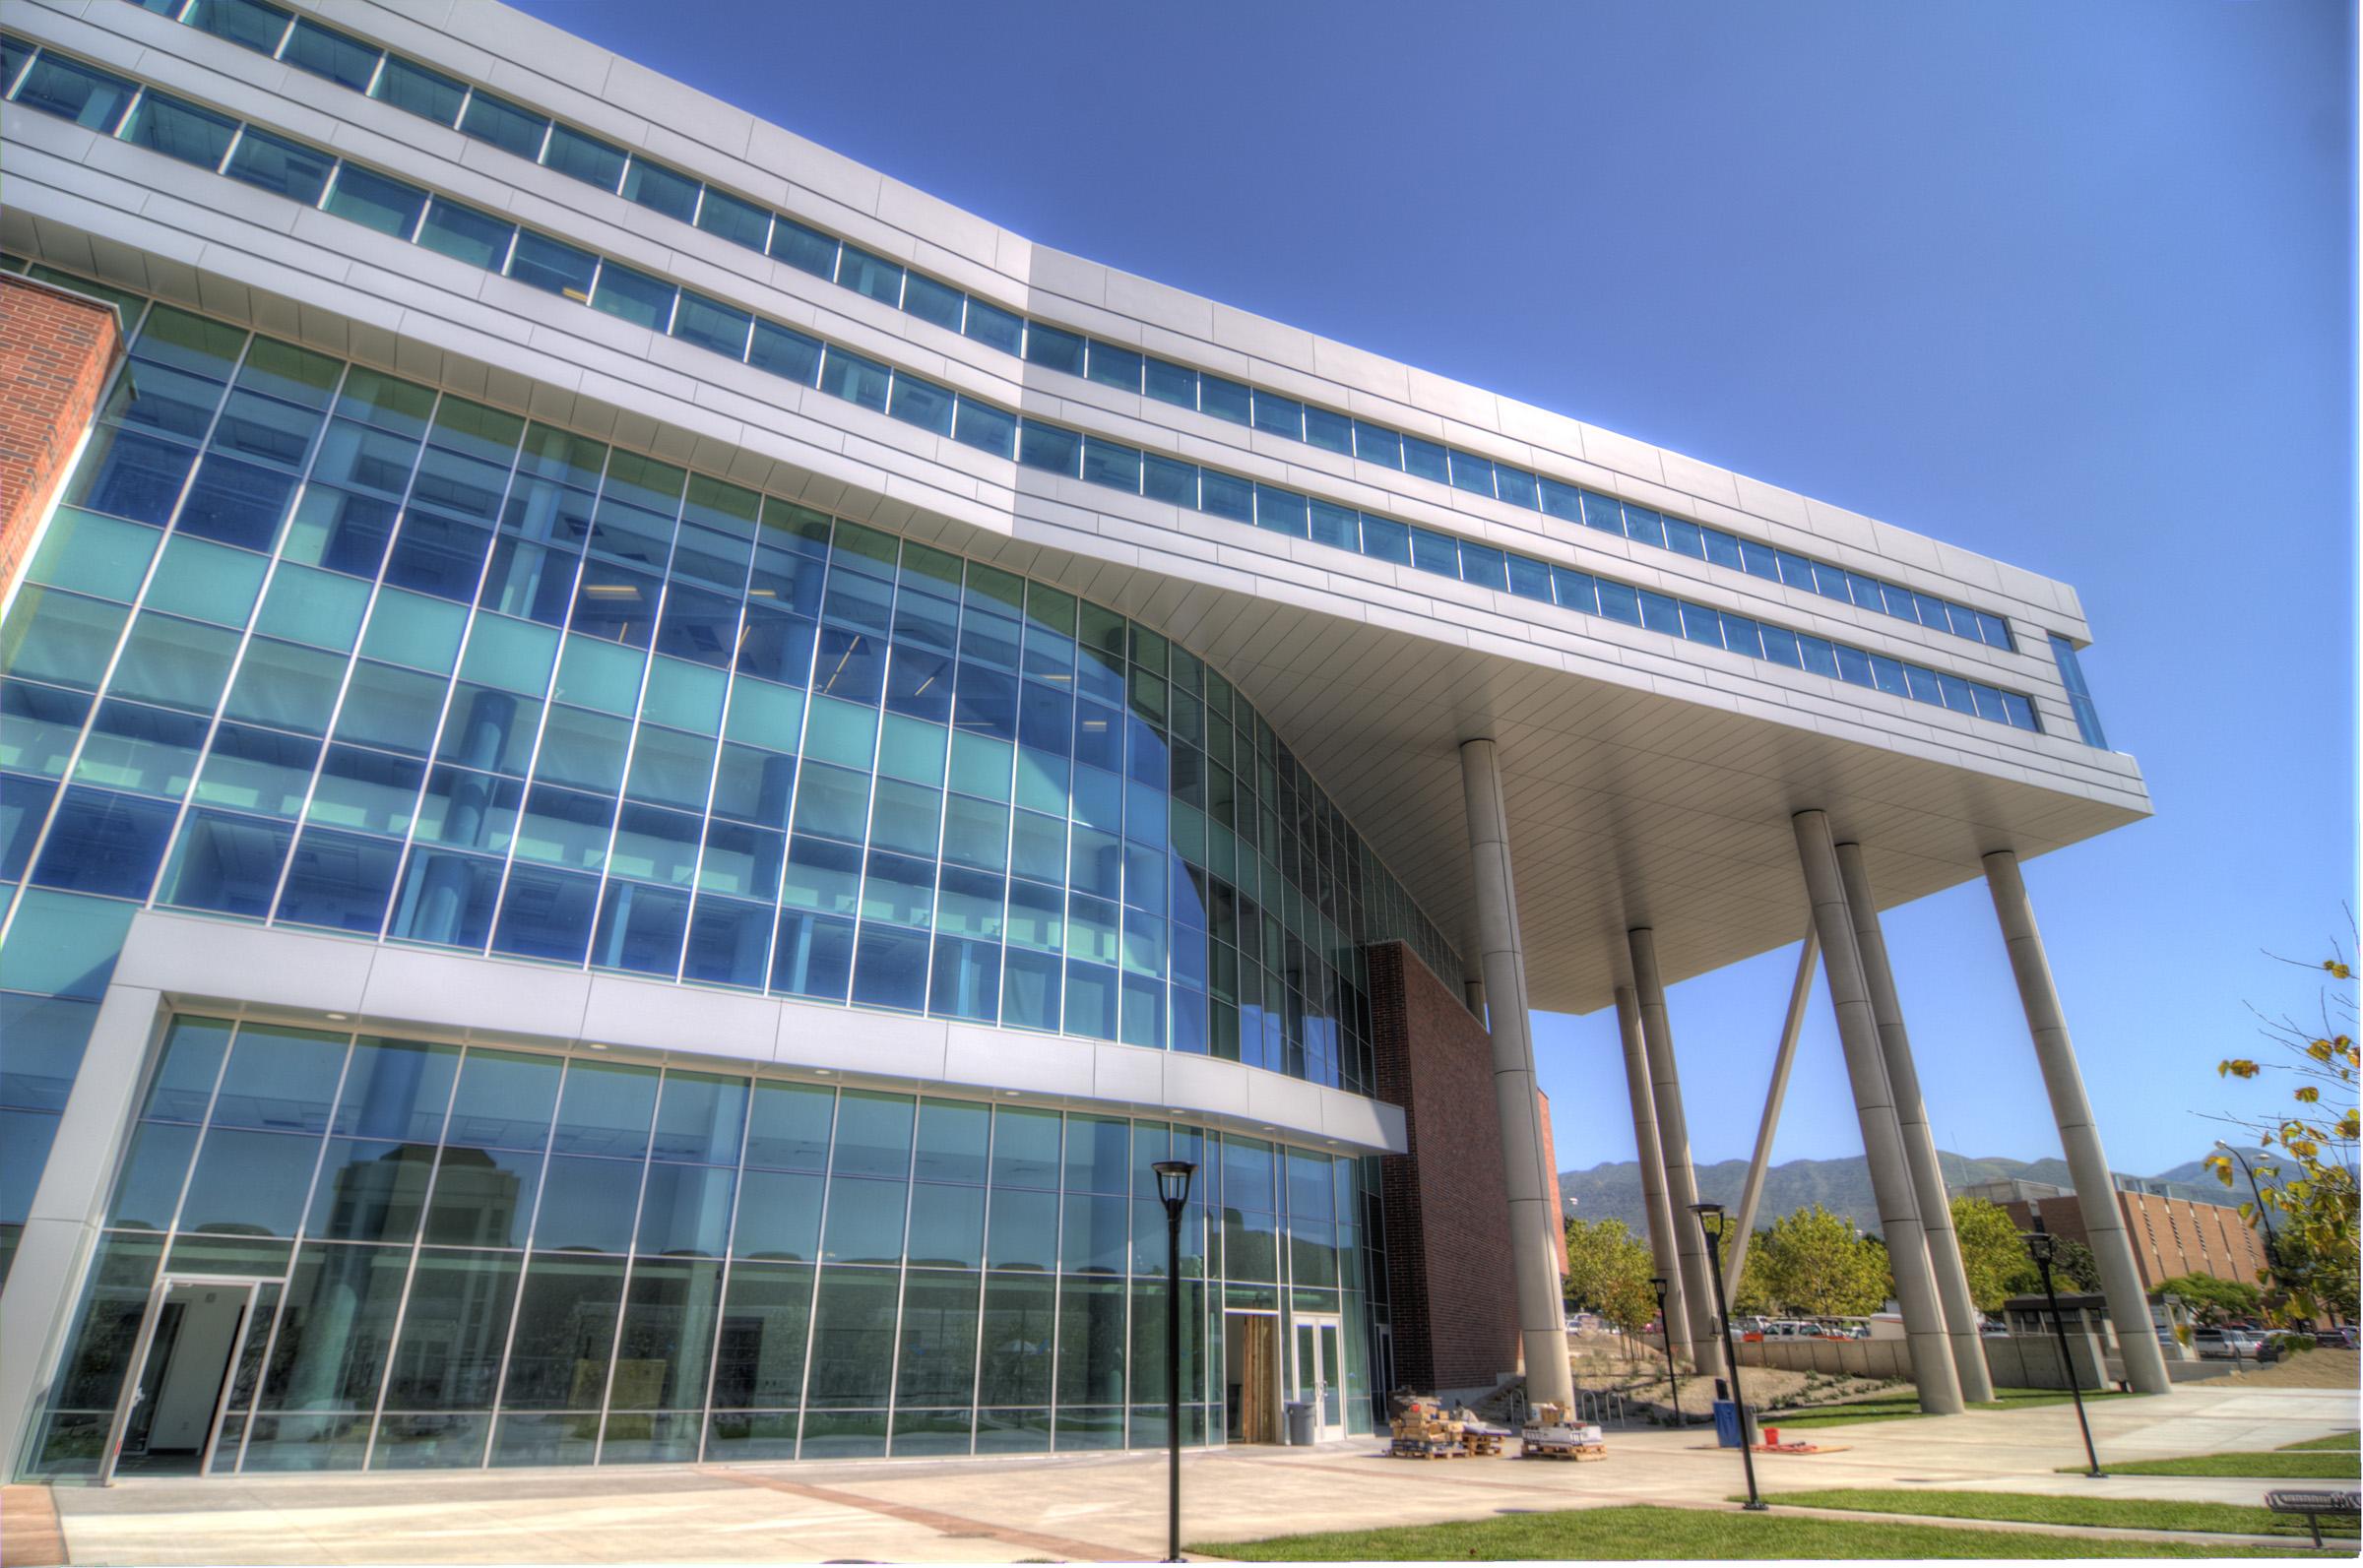 The University of Utah's new Spencer Fox Eccles Business Building.